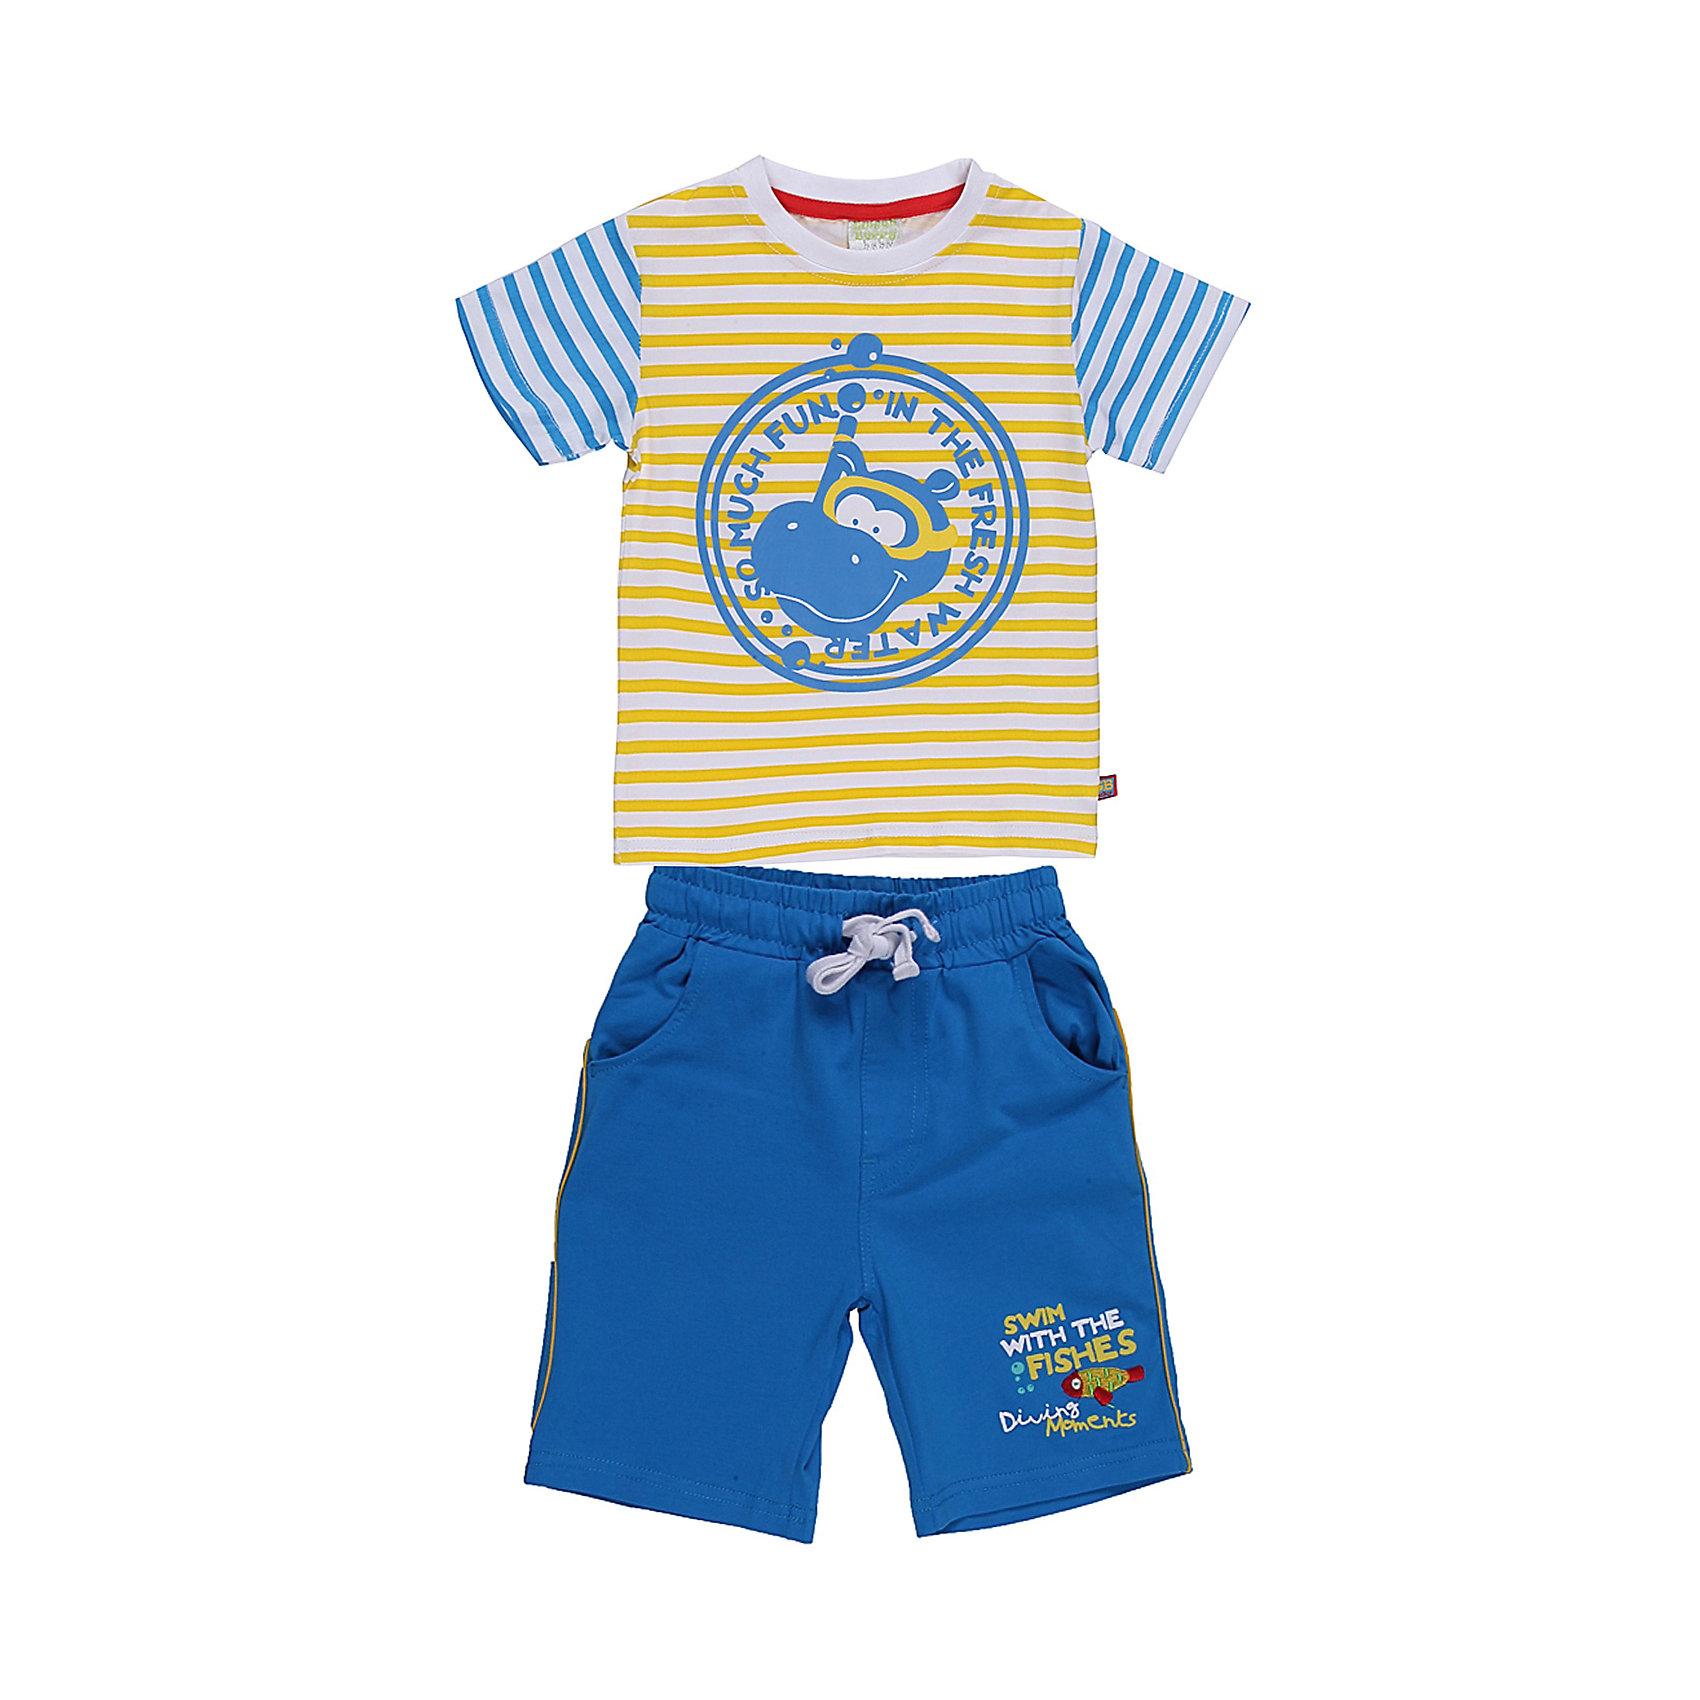 Sweet Berry Комплект для мальчика: футболка и шорты Sweet Berry